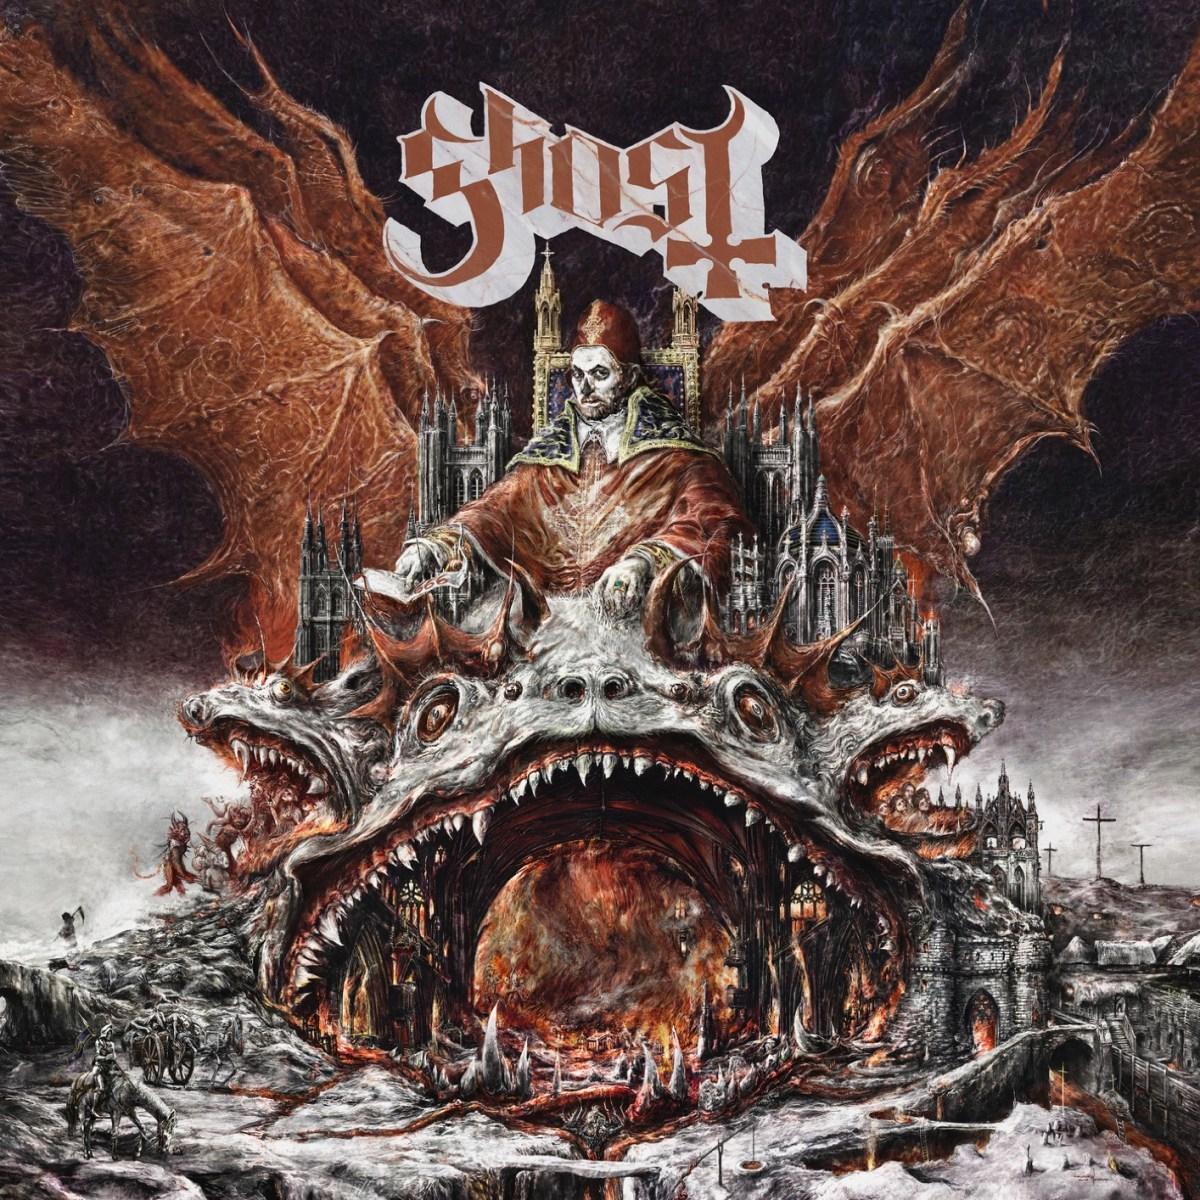 Ghost - Prequelle: The Ultimate Guide